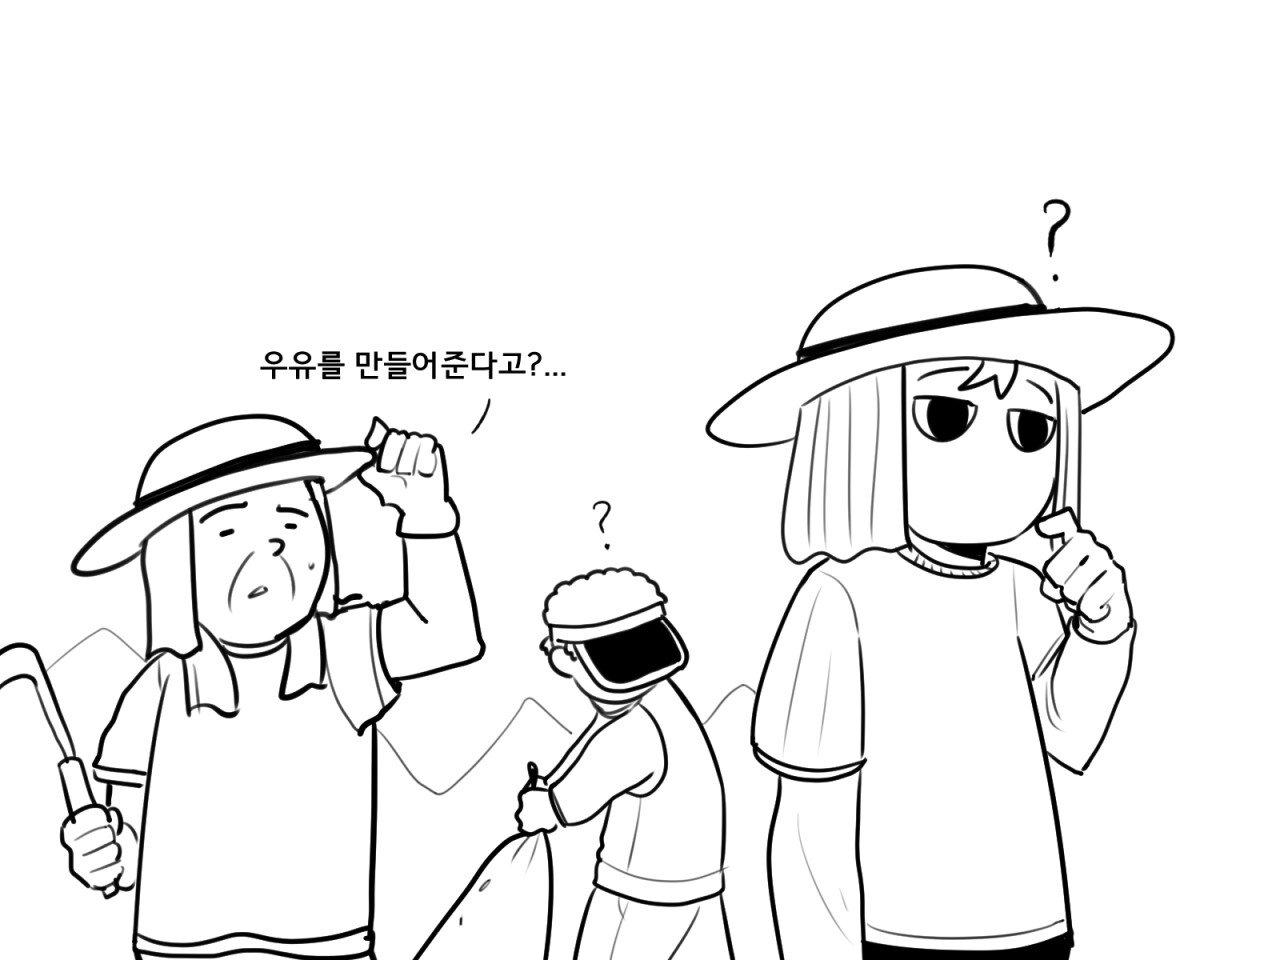 cartoon-20200407-235830-005.jpg ㅇㅎ) 우유 만드는 법.manhwa